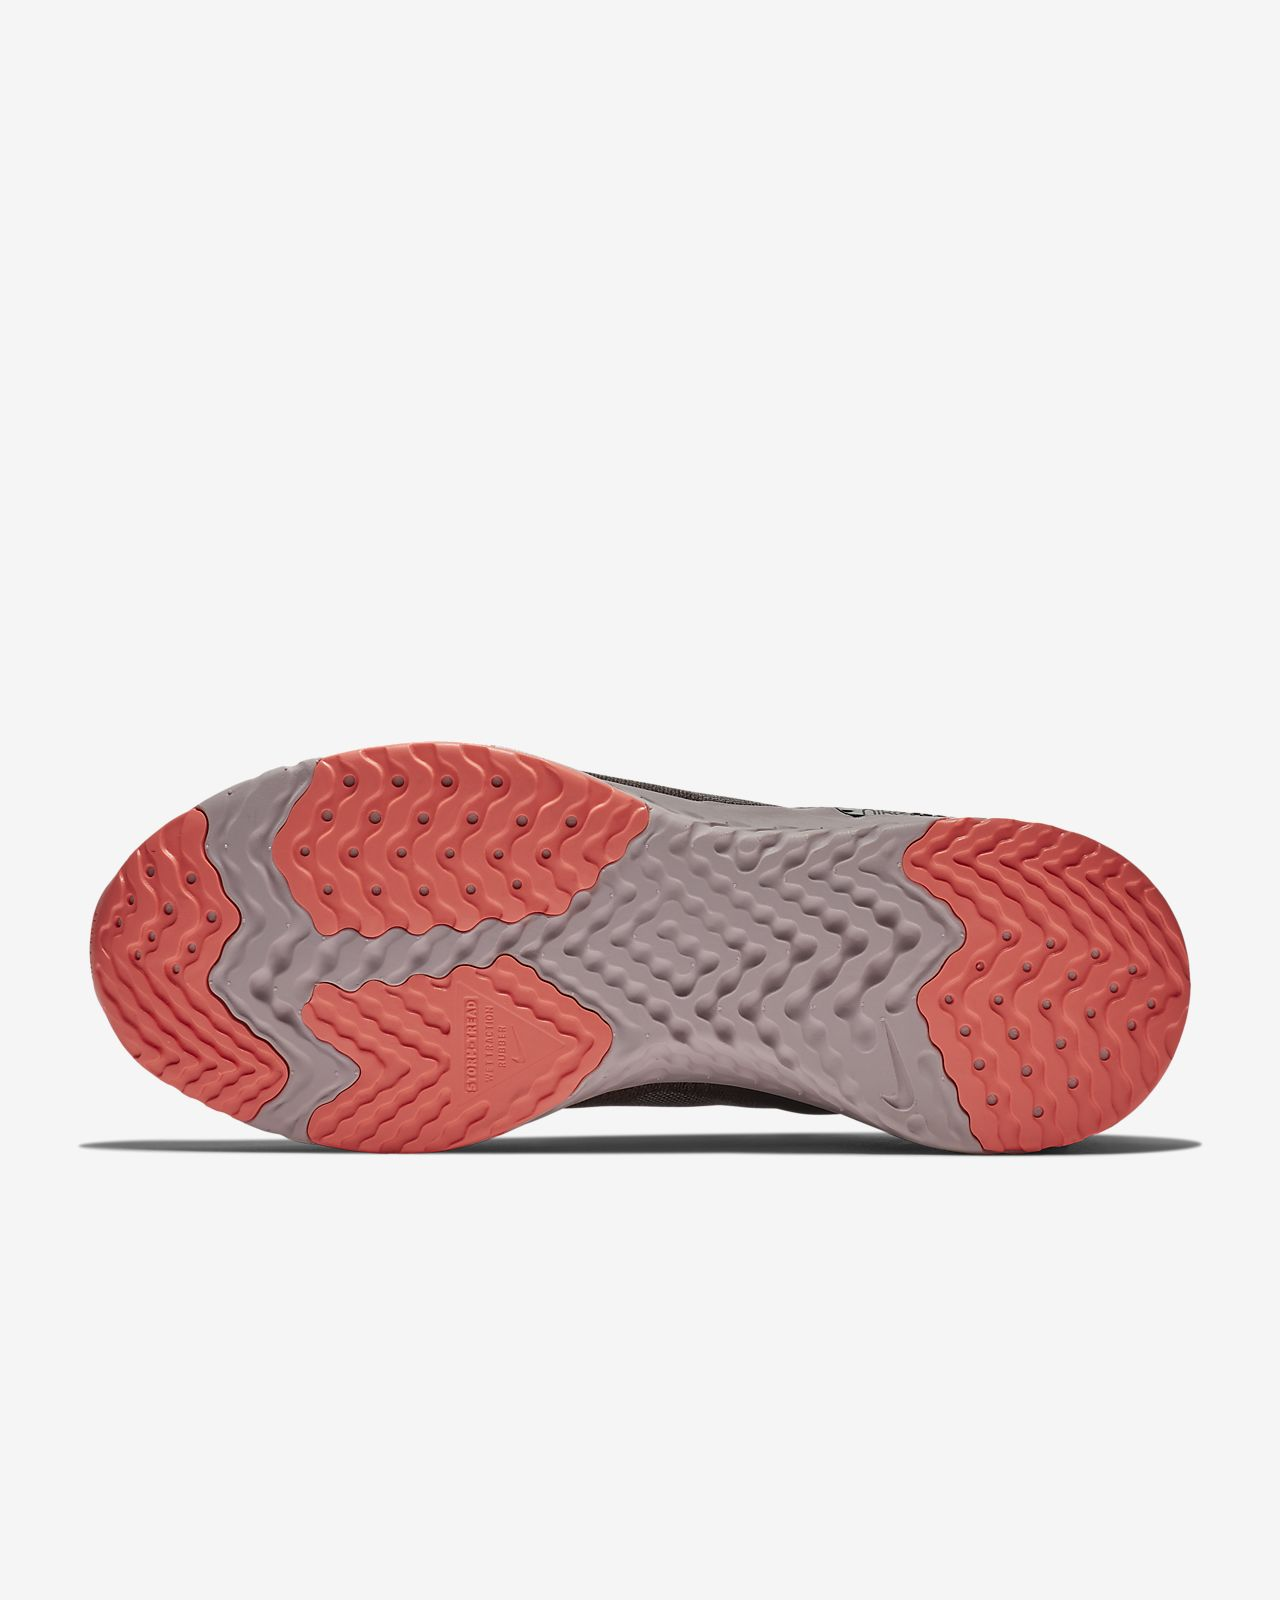 wholesale dealer c85b0 e9e00 ... Chaussure de running Nike Odyssey React Shield Water-Repellent pour  Femme